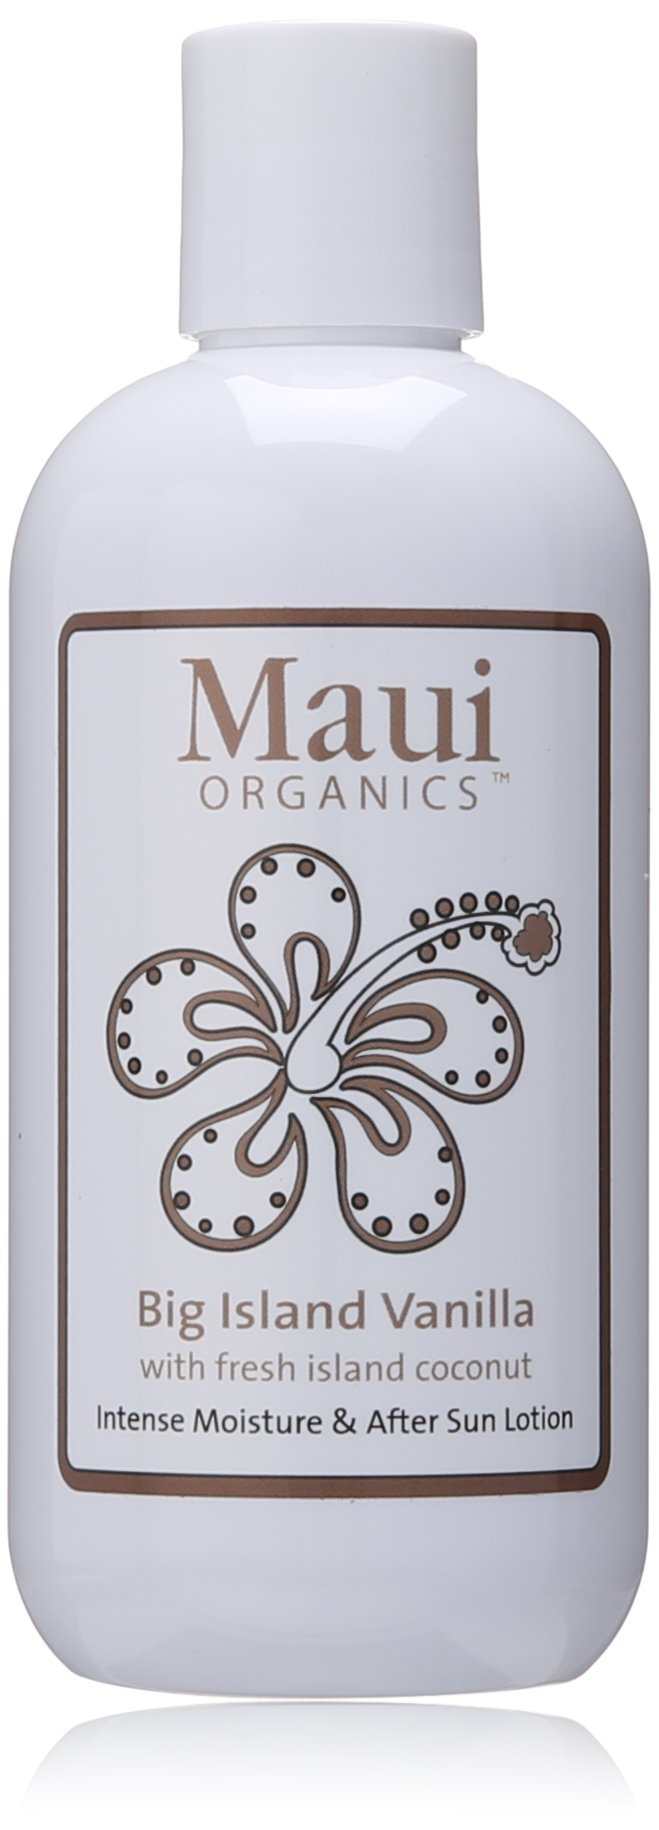 Maui Organics Intense Moisture and After Sun Lotion, Big Island Vanilla, 8.5 Ounce